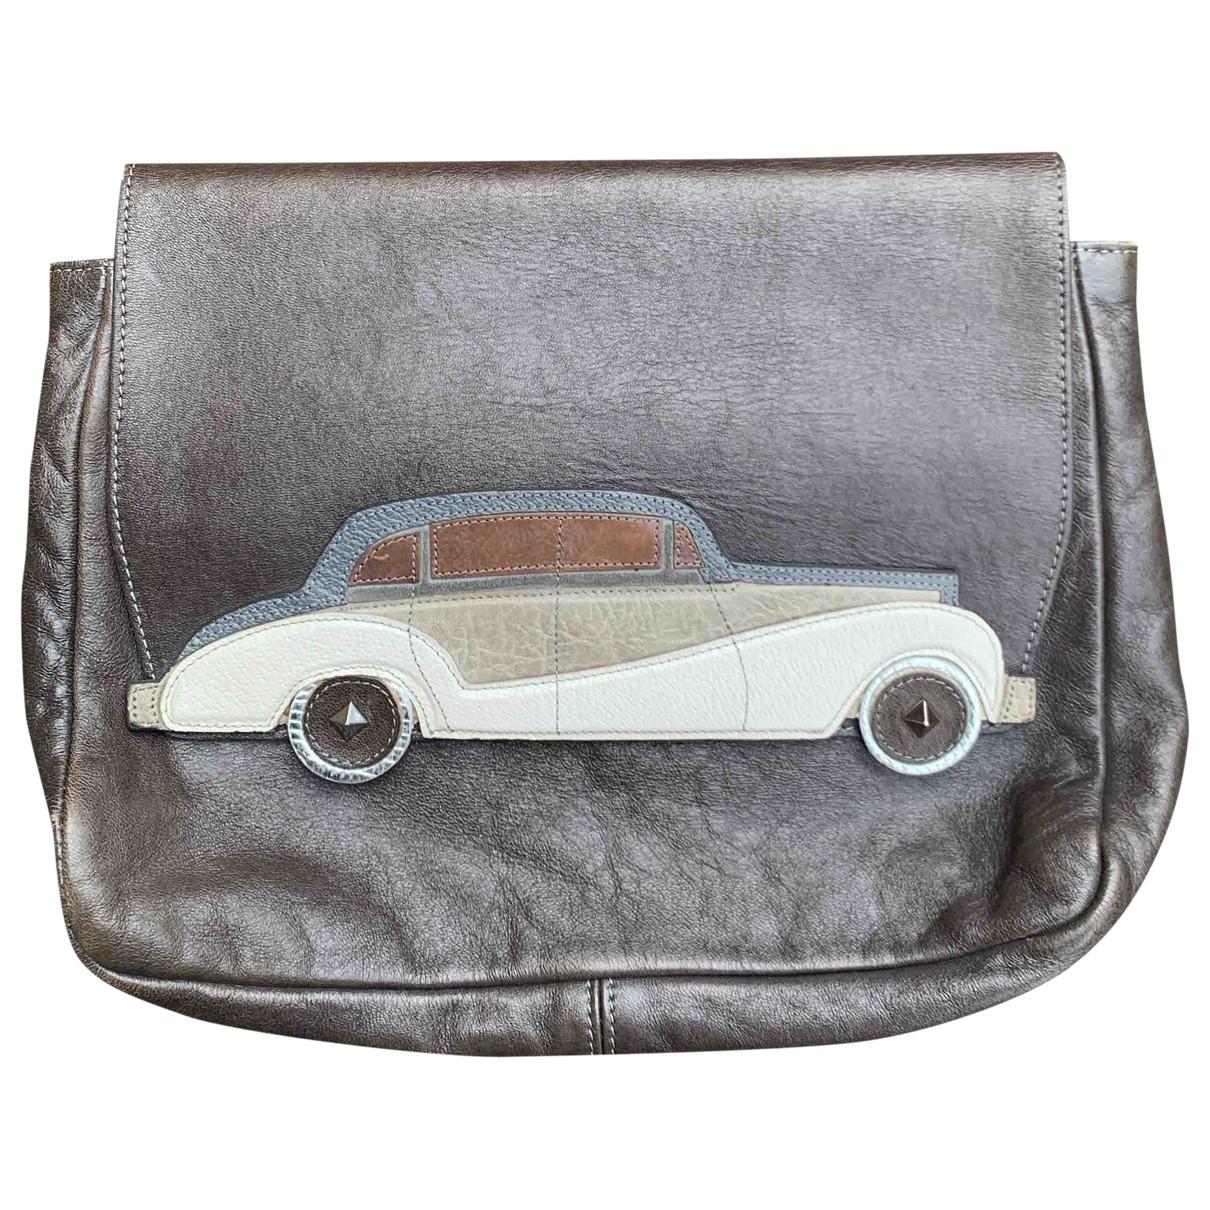 Marc Jacobs \N Grey Leather Clutch bag for Women \N